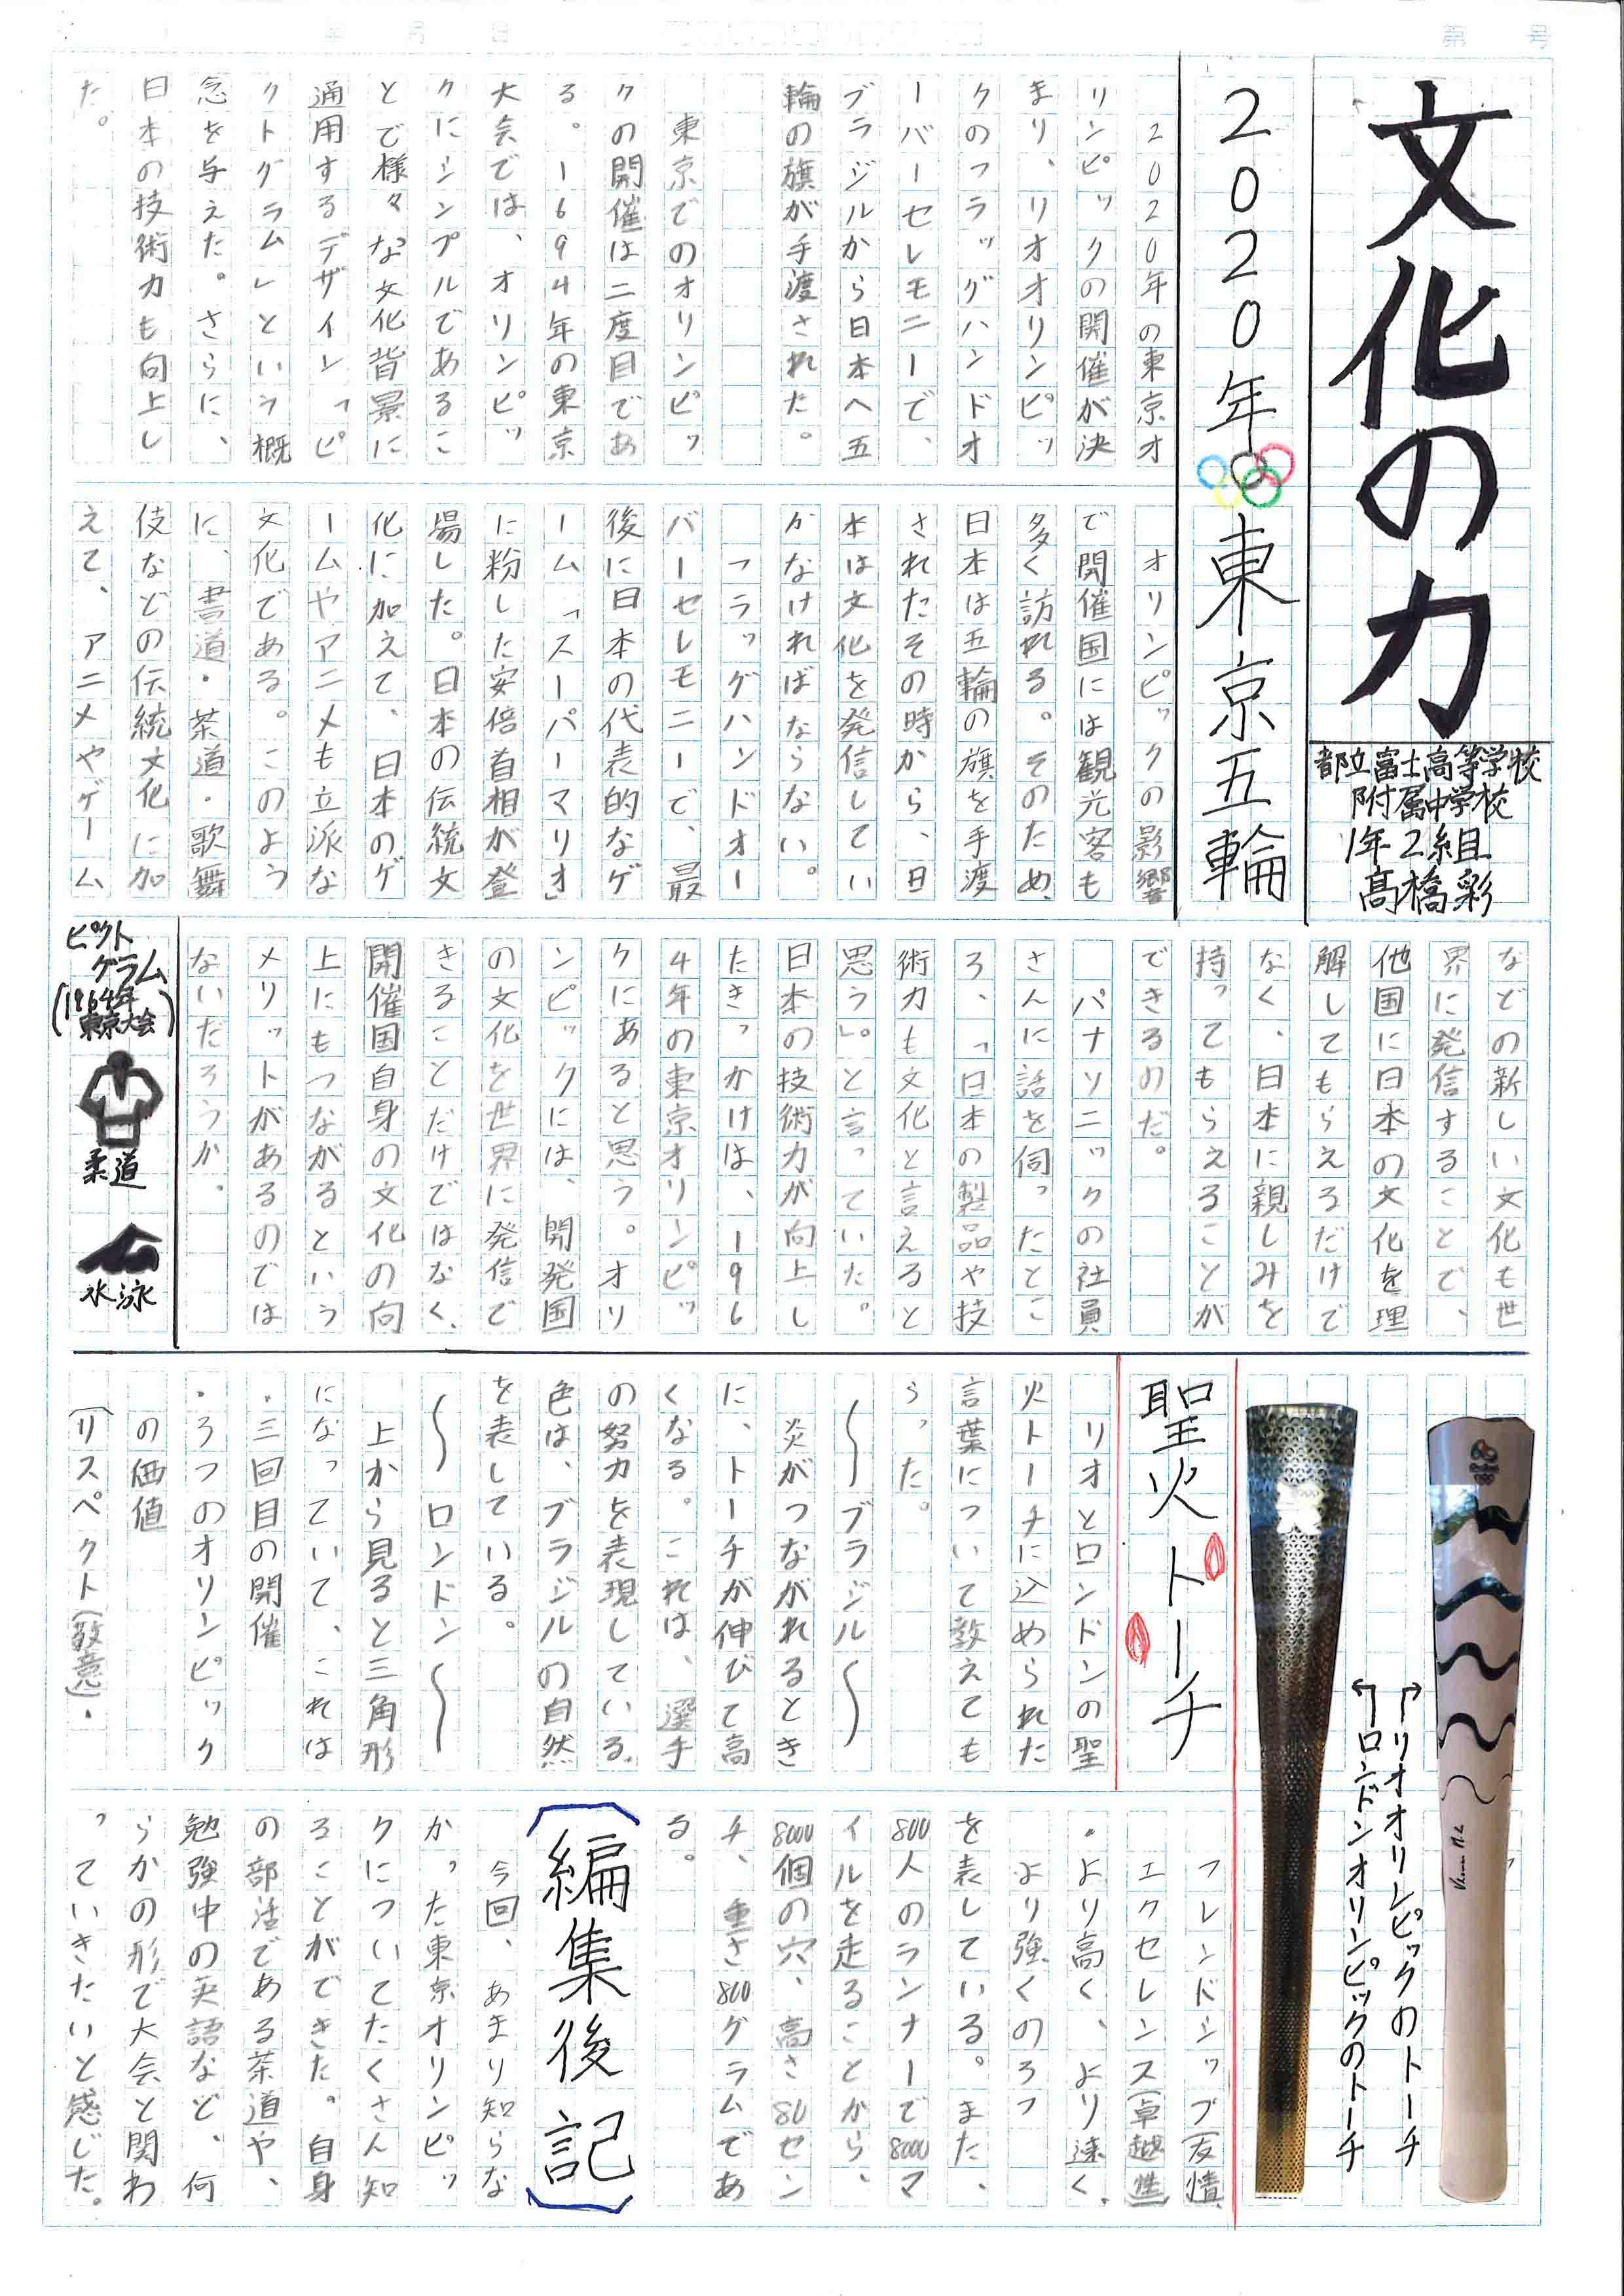 http://bunp.47news.jp/event/images/e_bunkachikara_takahasi1711.jpg